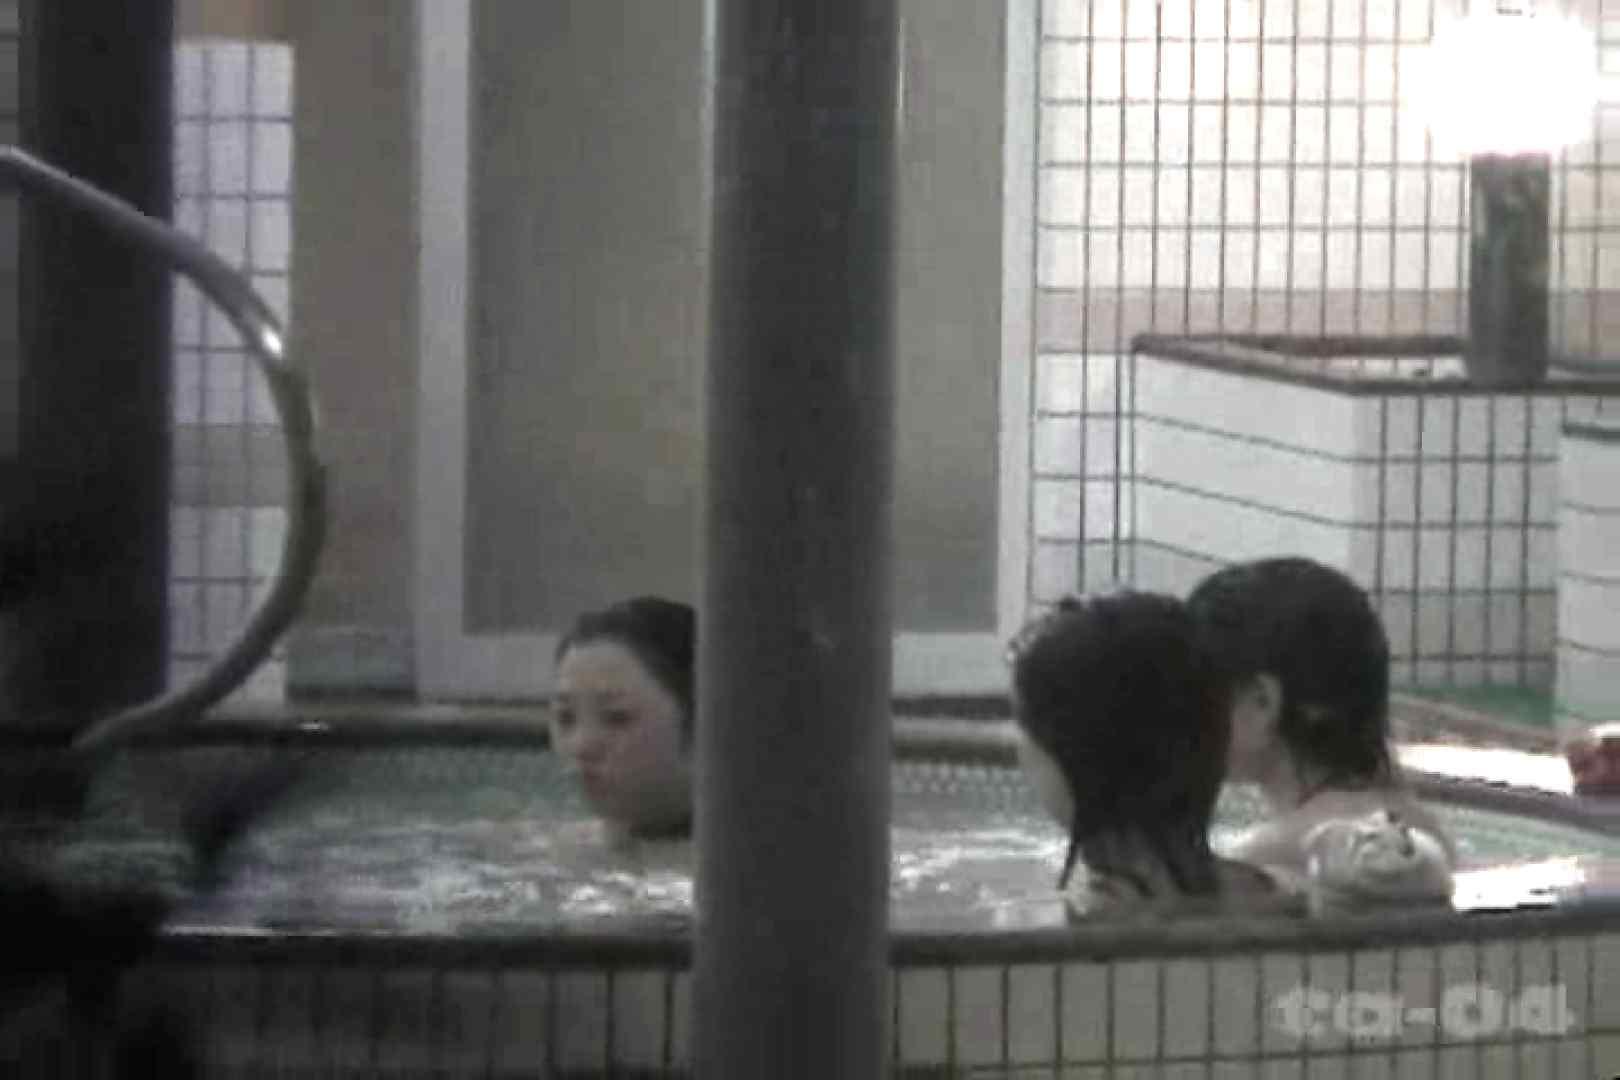 合宿ホテル女風呂盗撮高画質版 Vol.04 女風呂 オメコ無修正動画無料 83画像 39